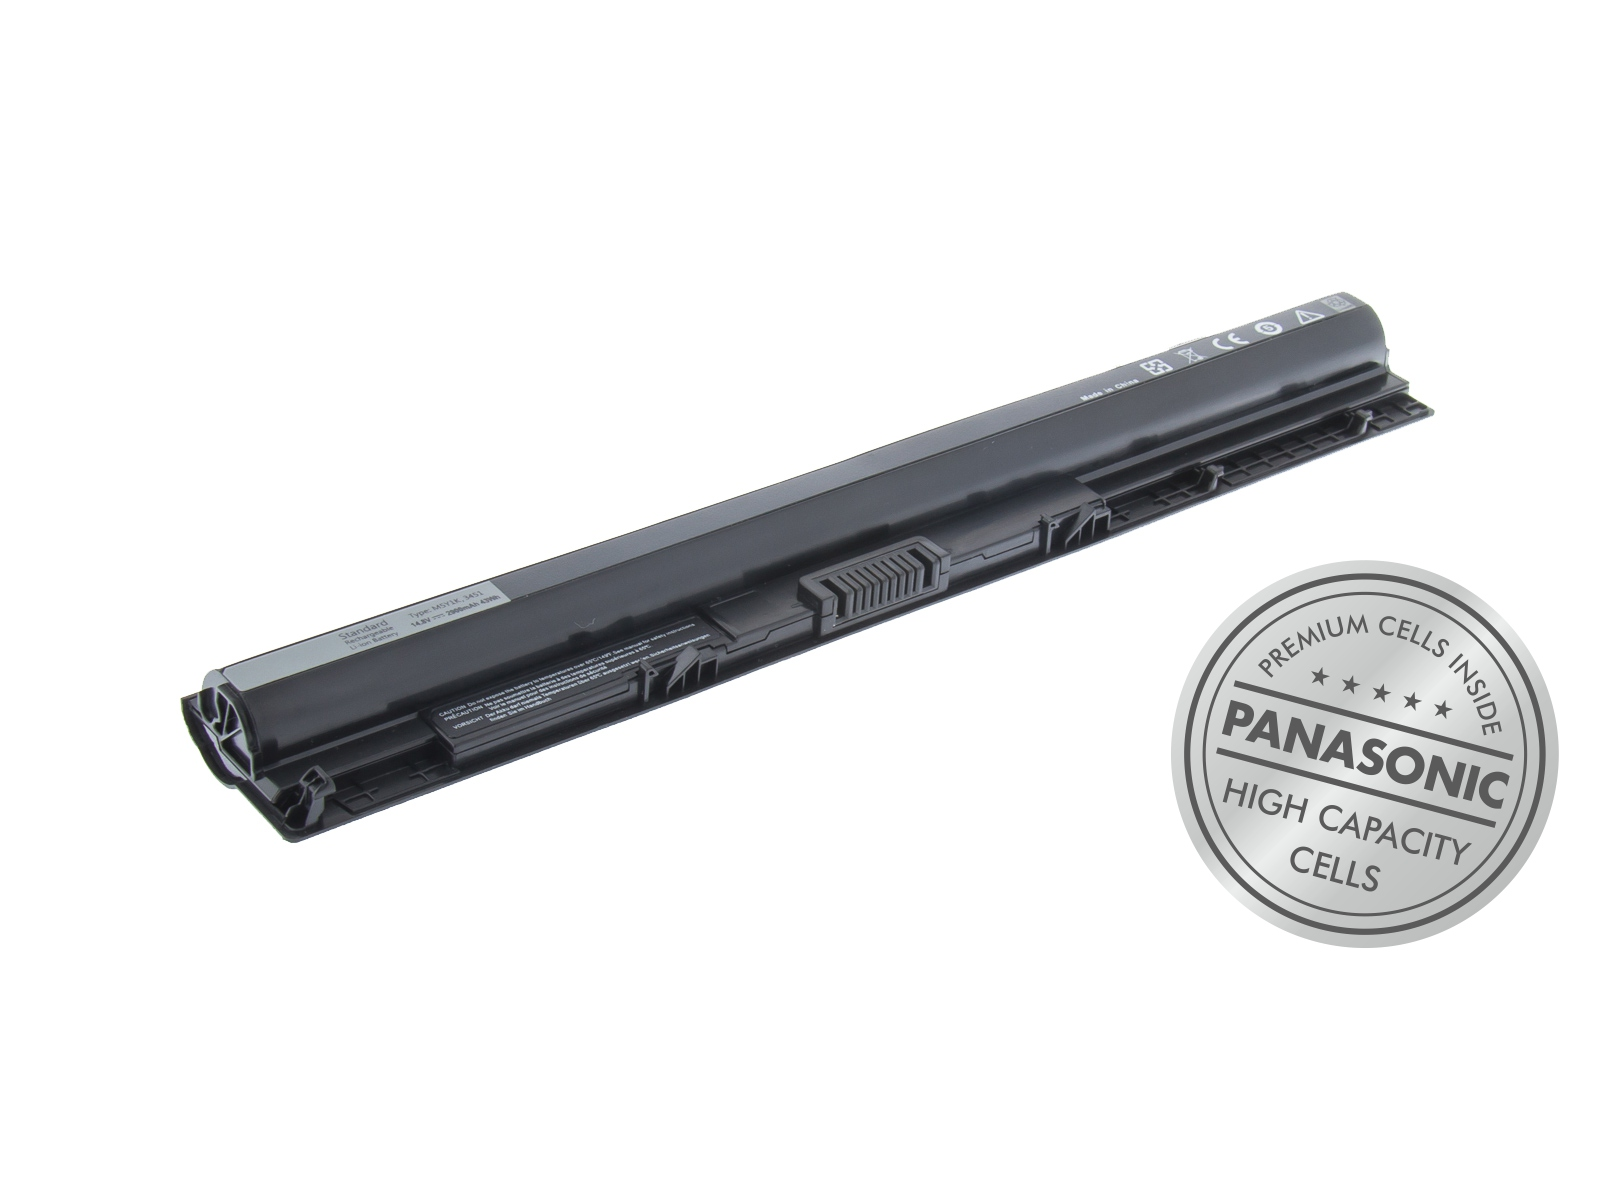 Baterie AVACOM NODE-I1555-P29 pro Dell Inspiron 15 5000, Vostro 15 3558 Li-Ion 14,8V 2900mAh